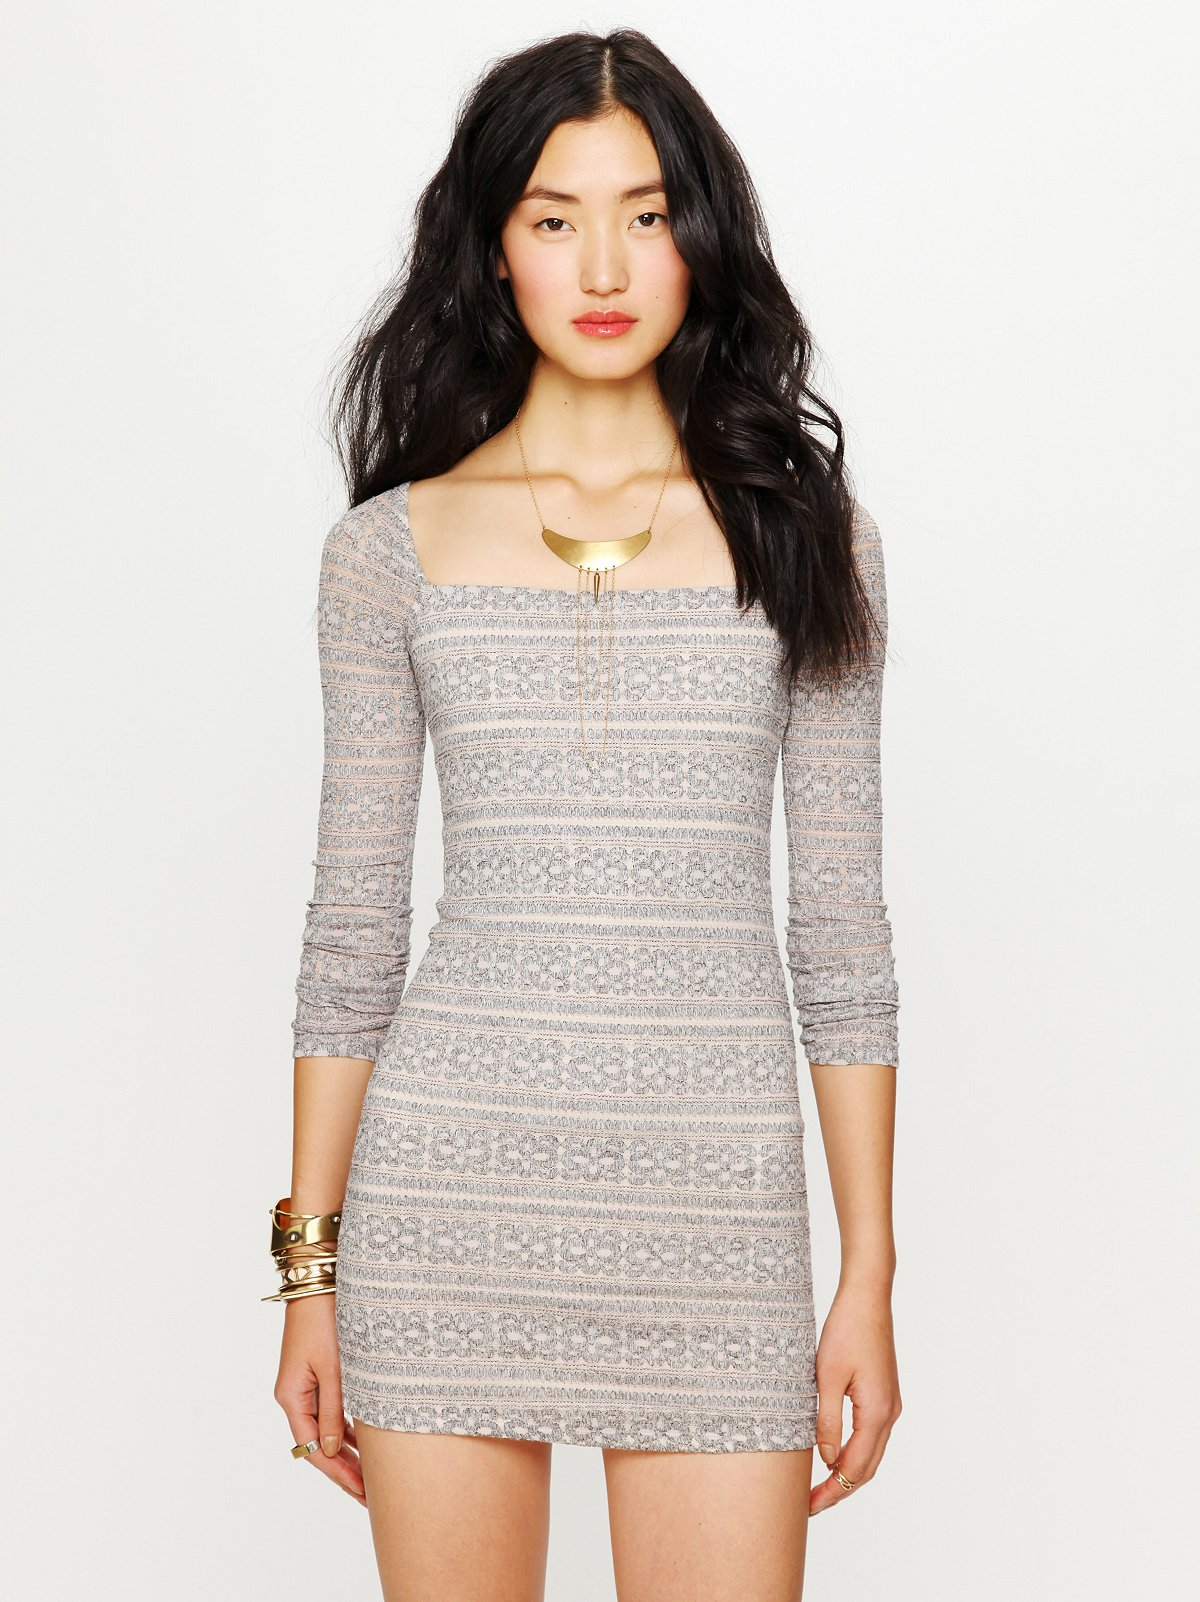 Good Girl Gone Bad Bodycon Dress